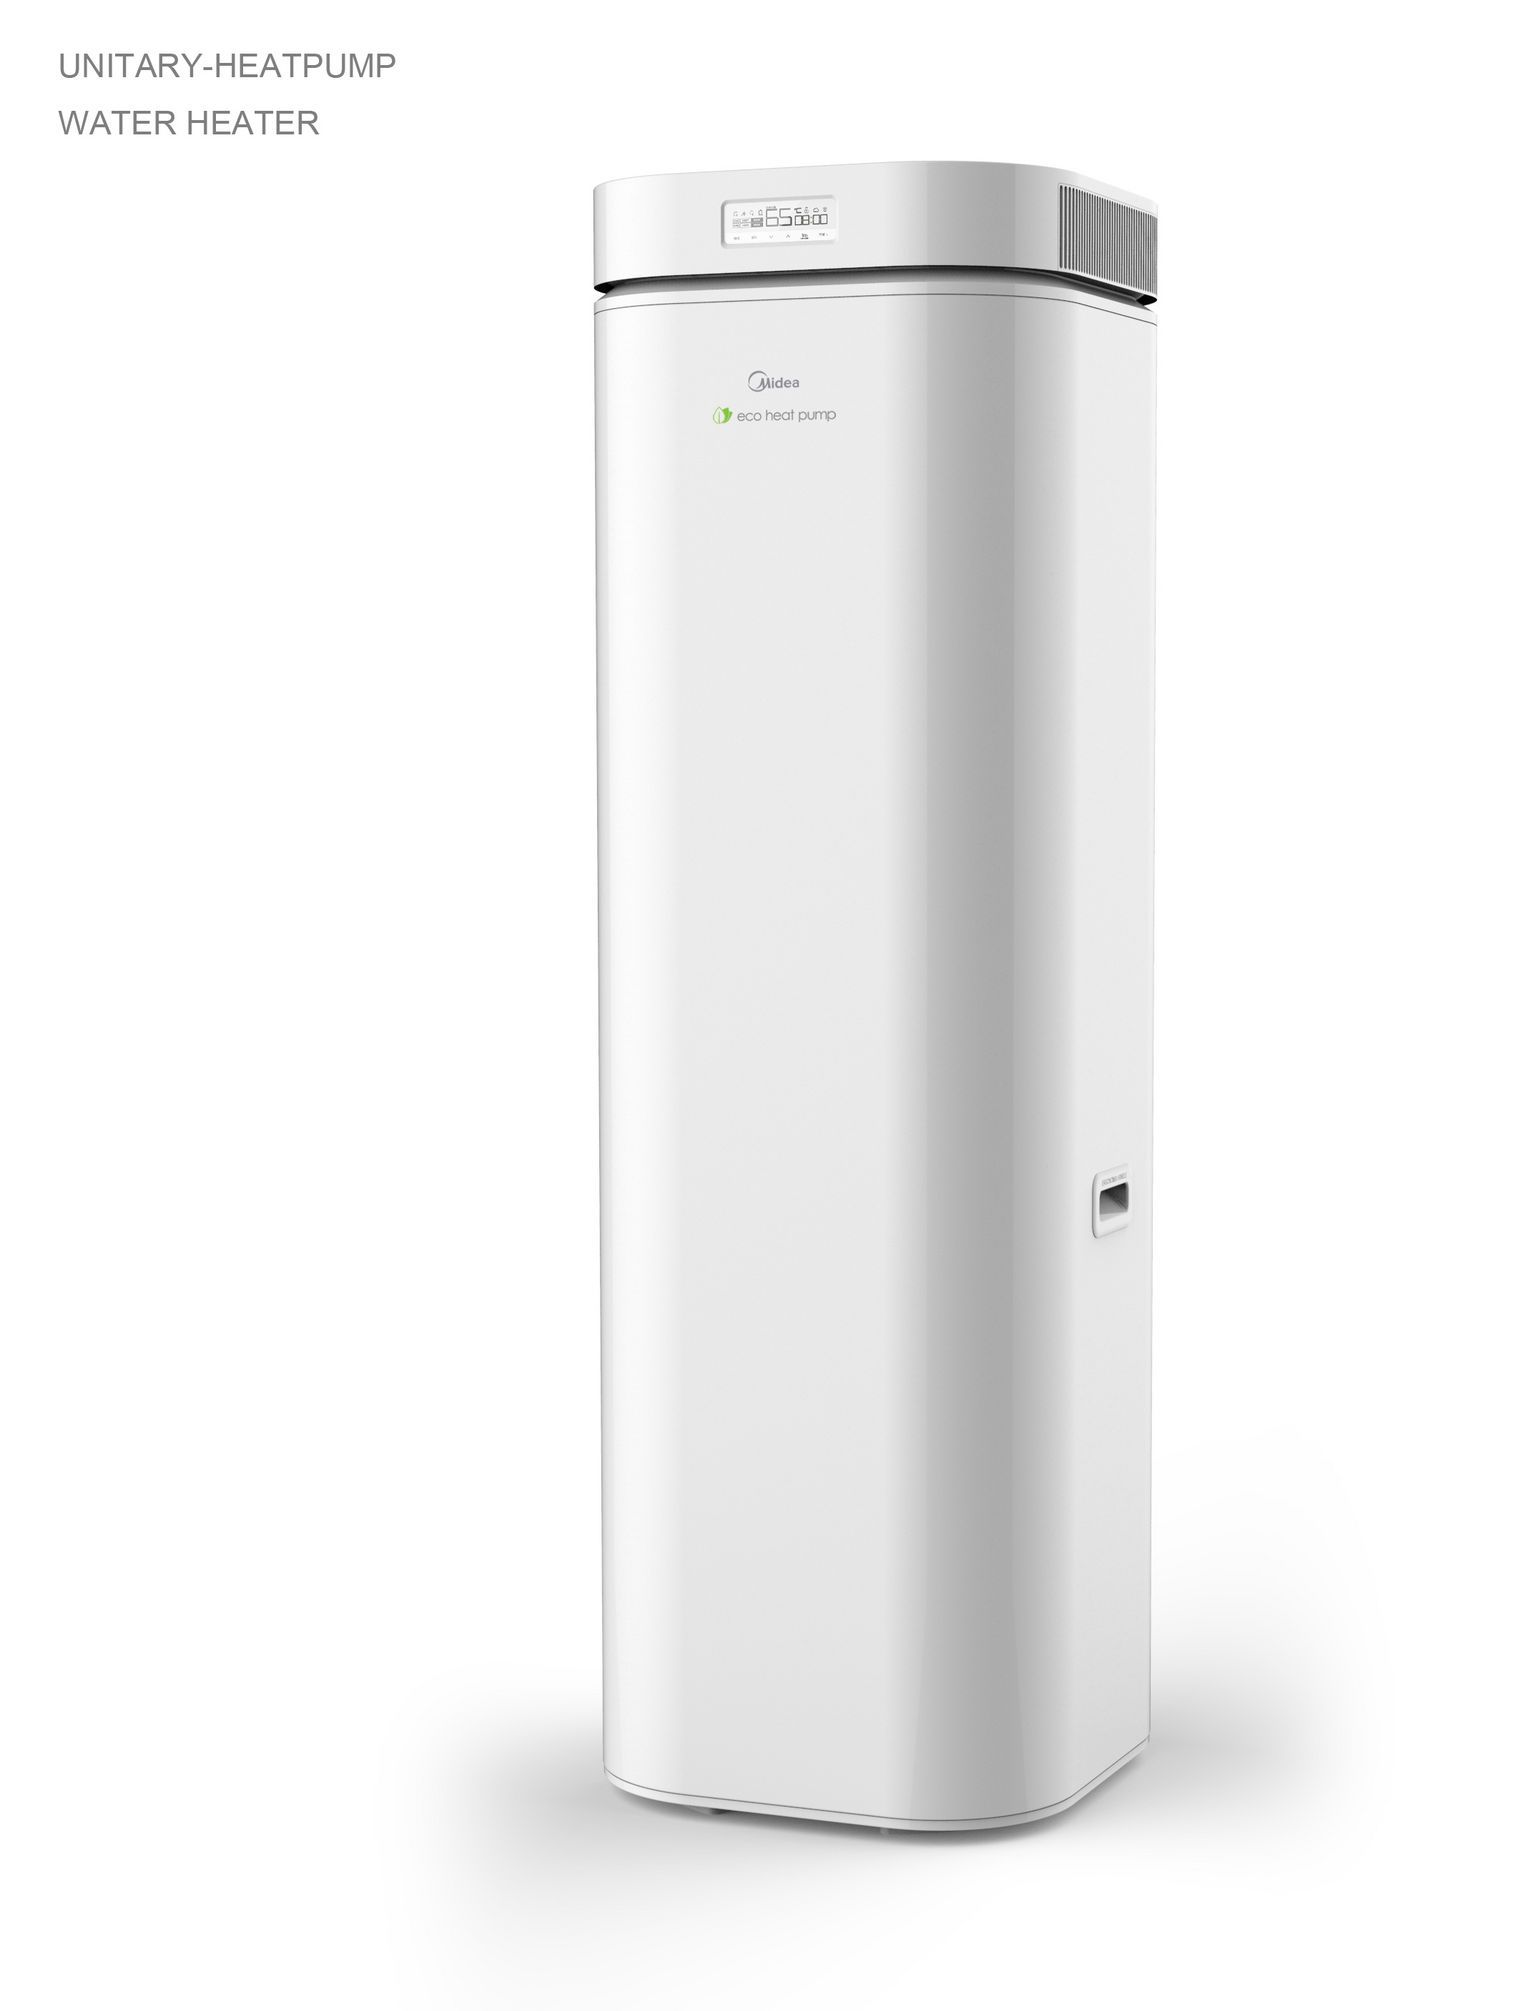 Rsj N15 Heat Pump Water Heater Beitragsdetails If Online Exhibition Air Purifier Design Water Design Electric Heating Systems